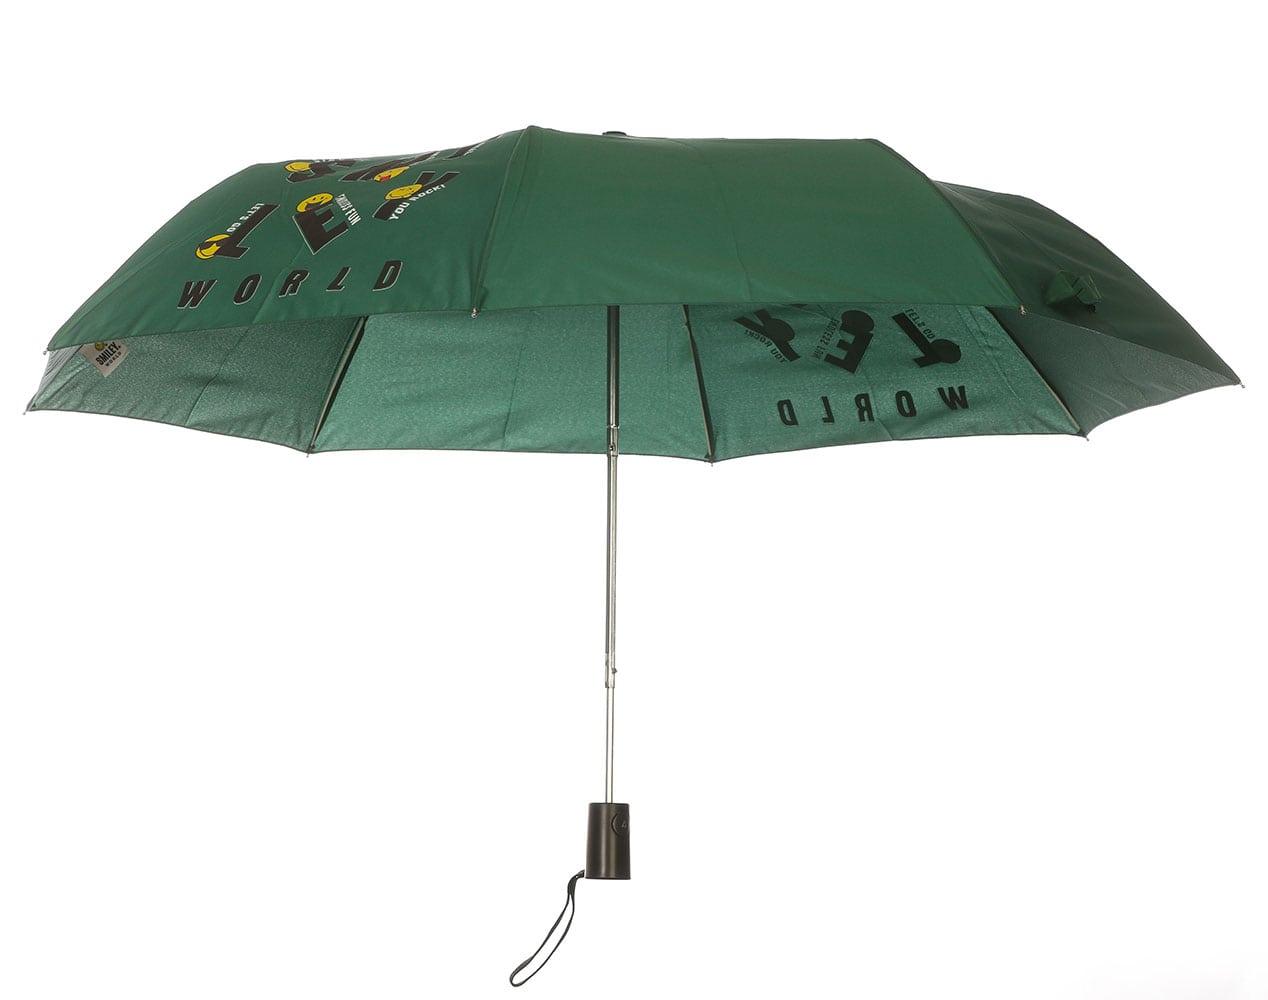 Smiley World Ομπρέλα Σπαστή με Αυτόματο Μηχανισμό SML-9430 Πράσινο